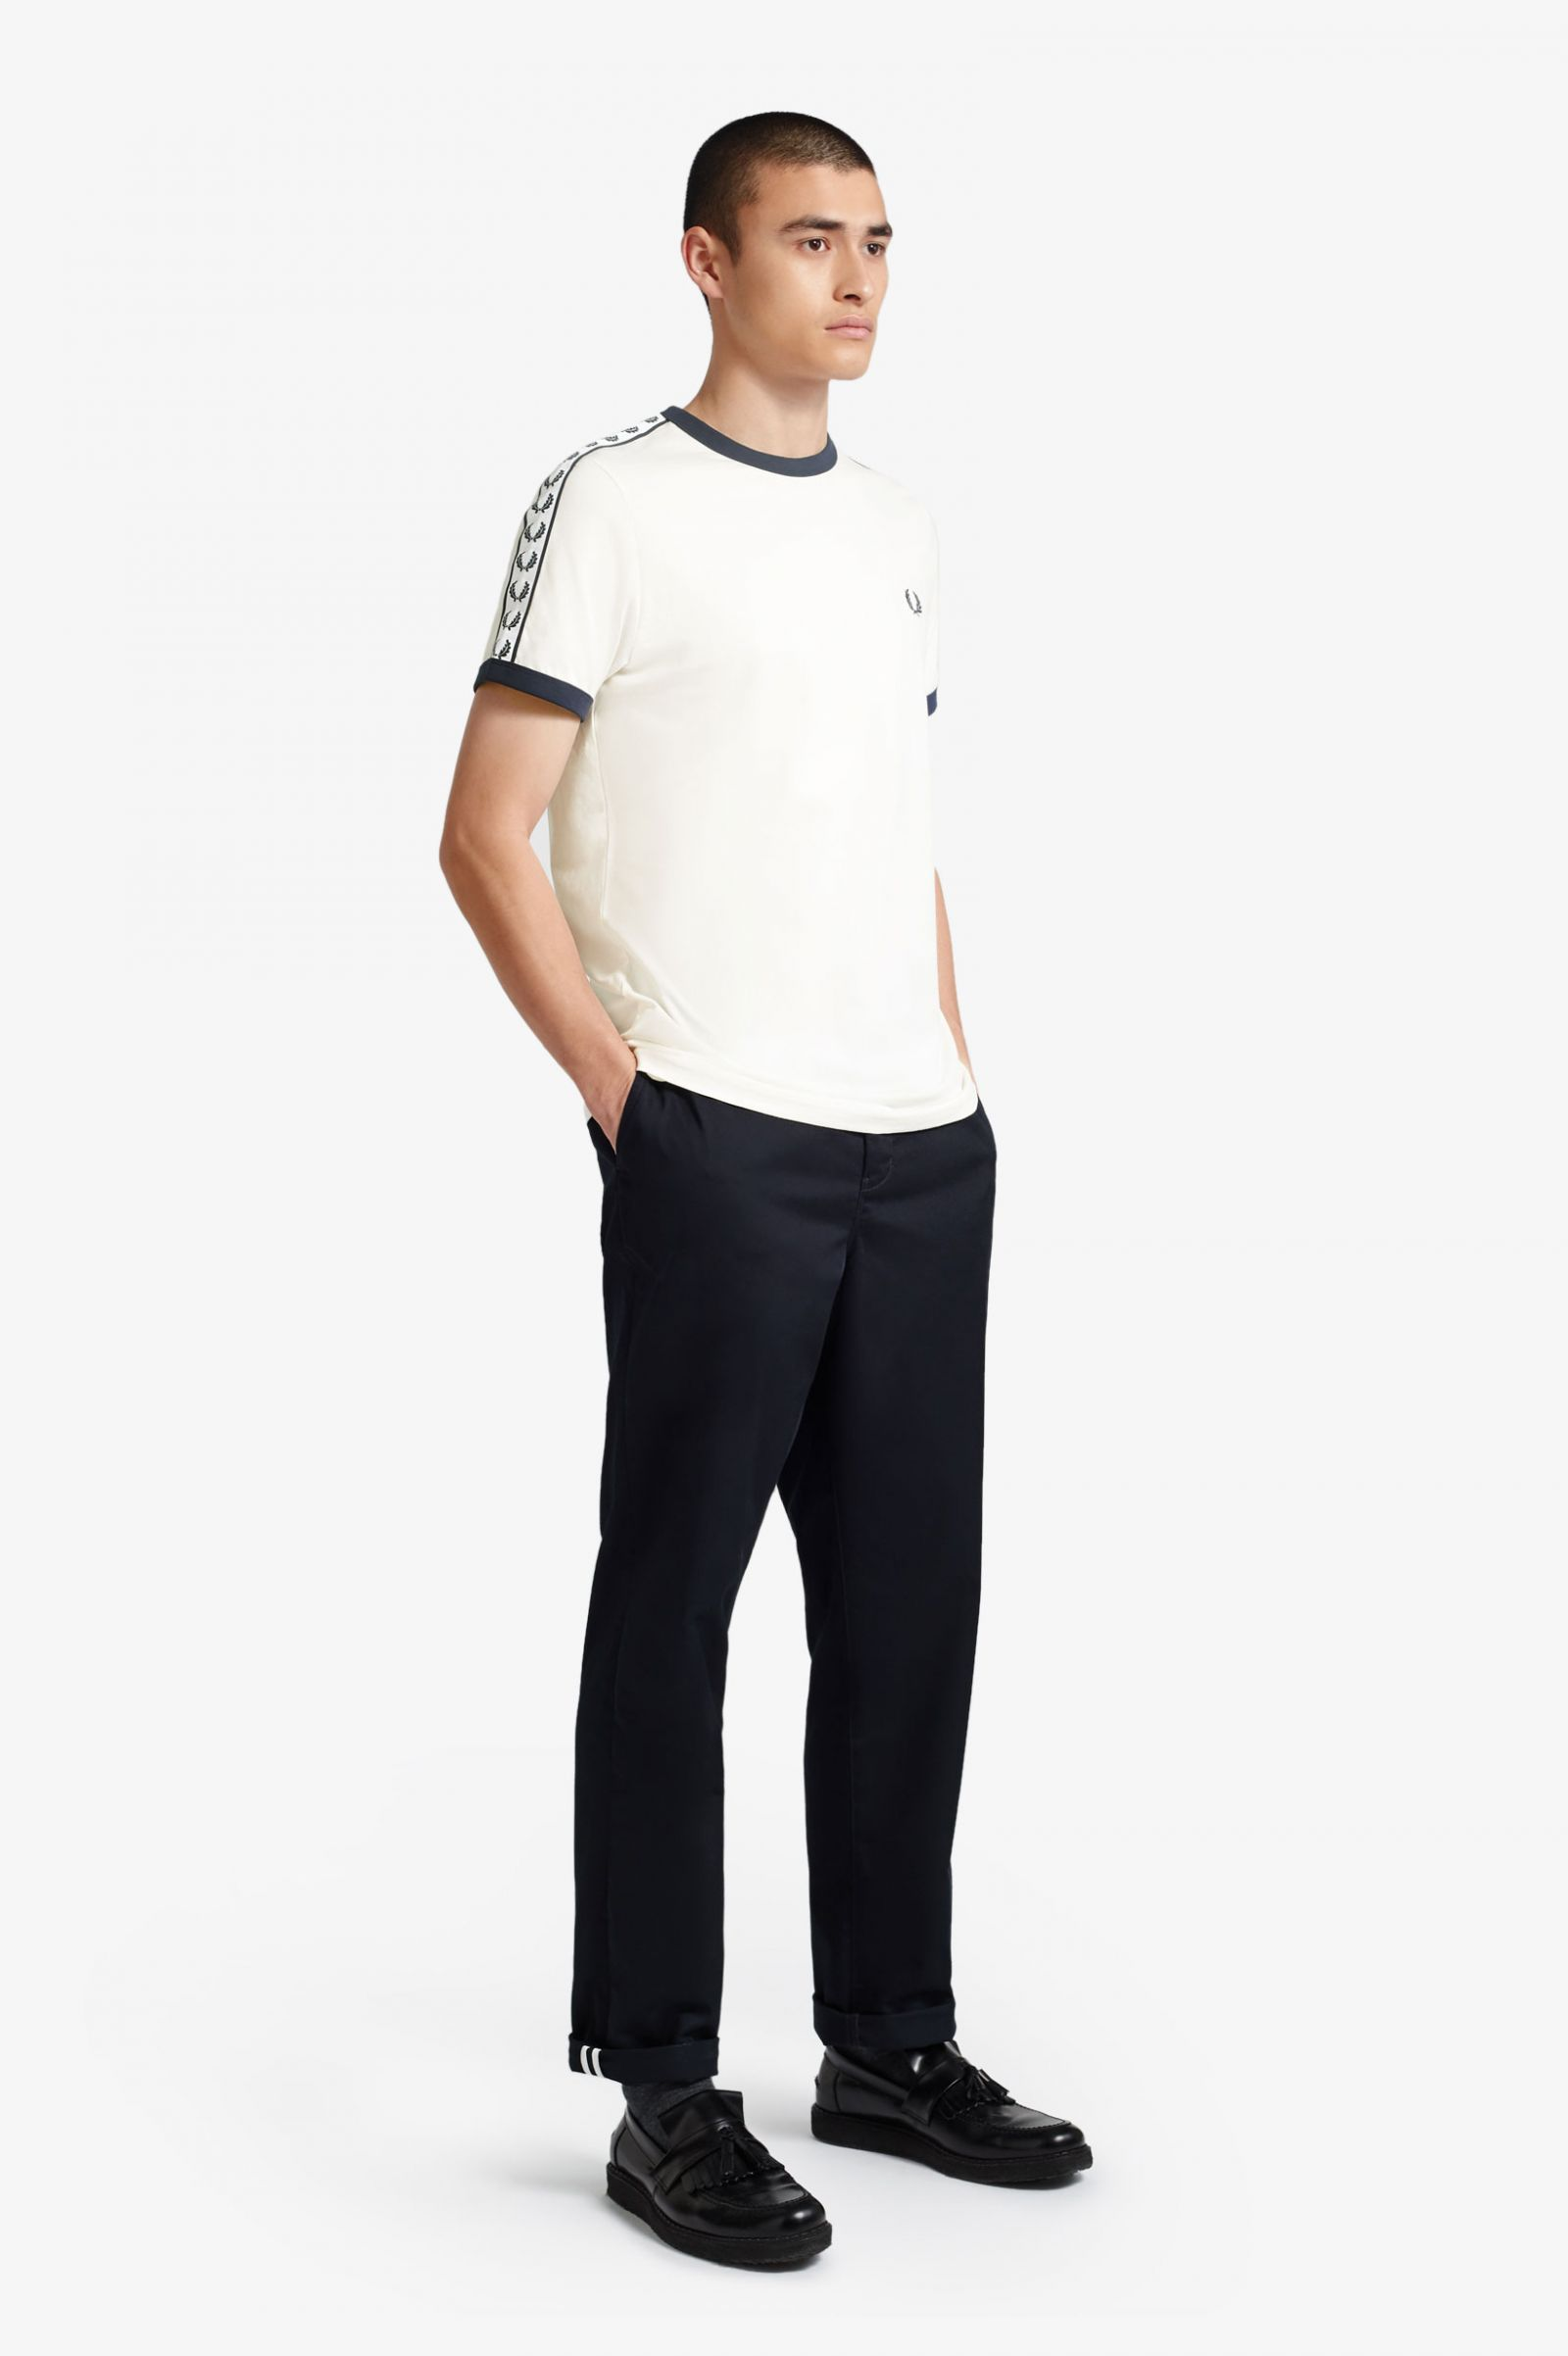 Camiseta Ringer Con Cinta Blanco Nieve | Camisas Para